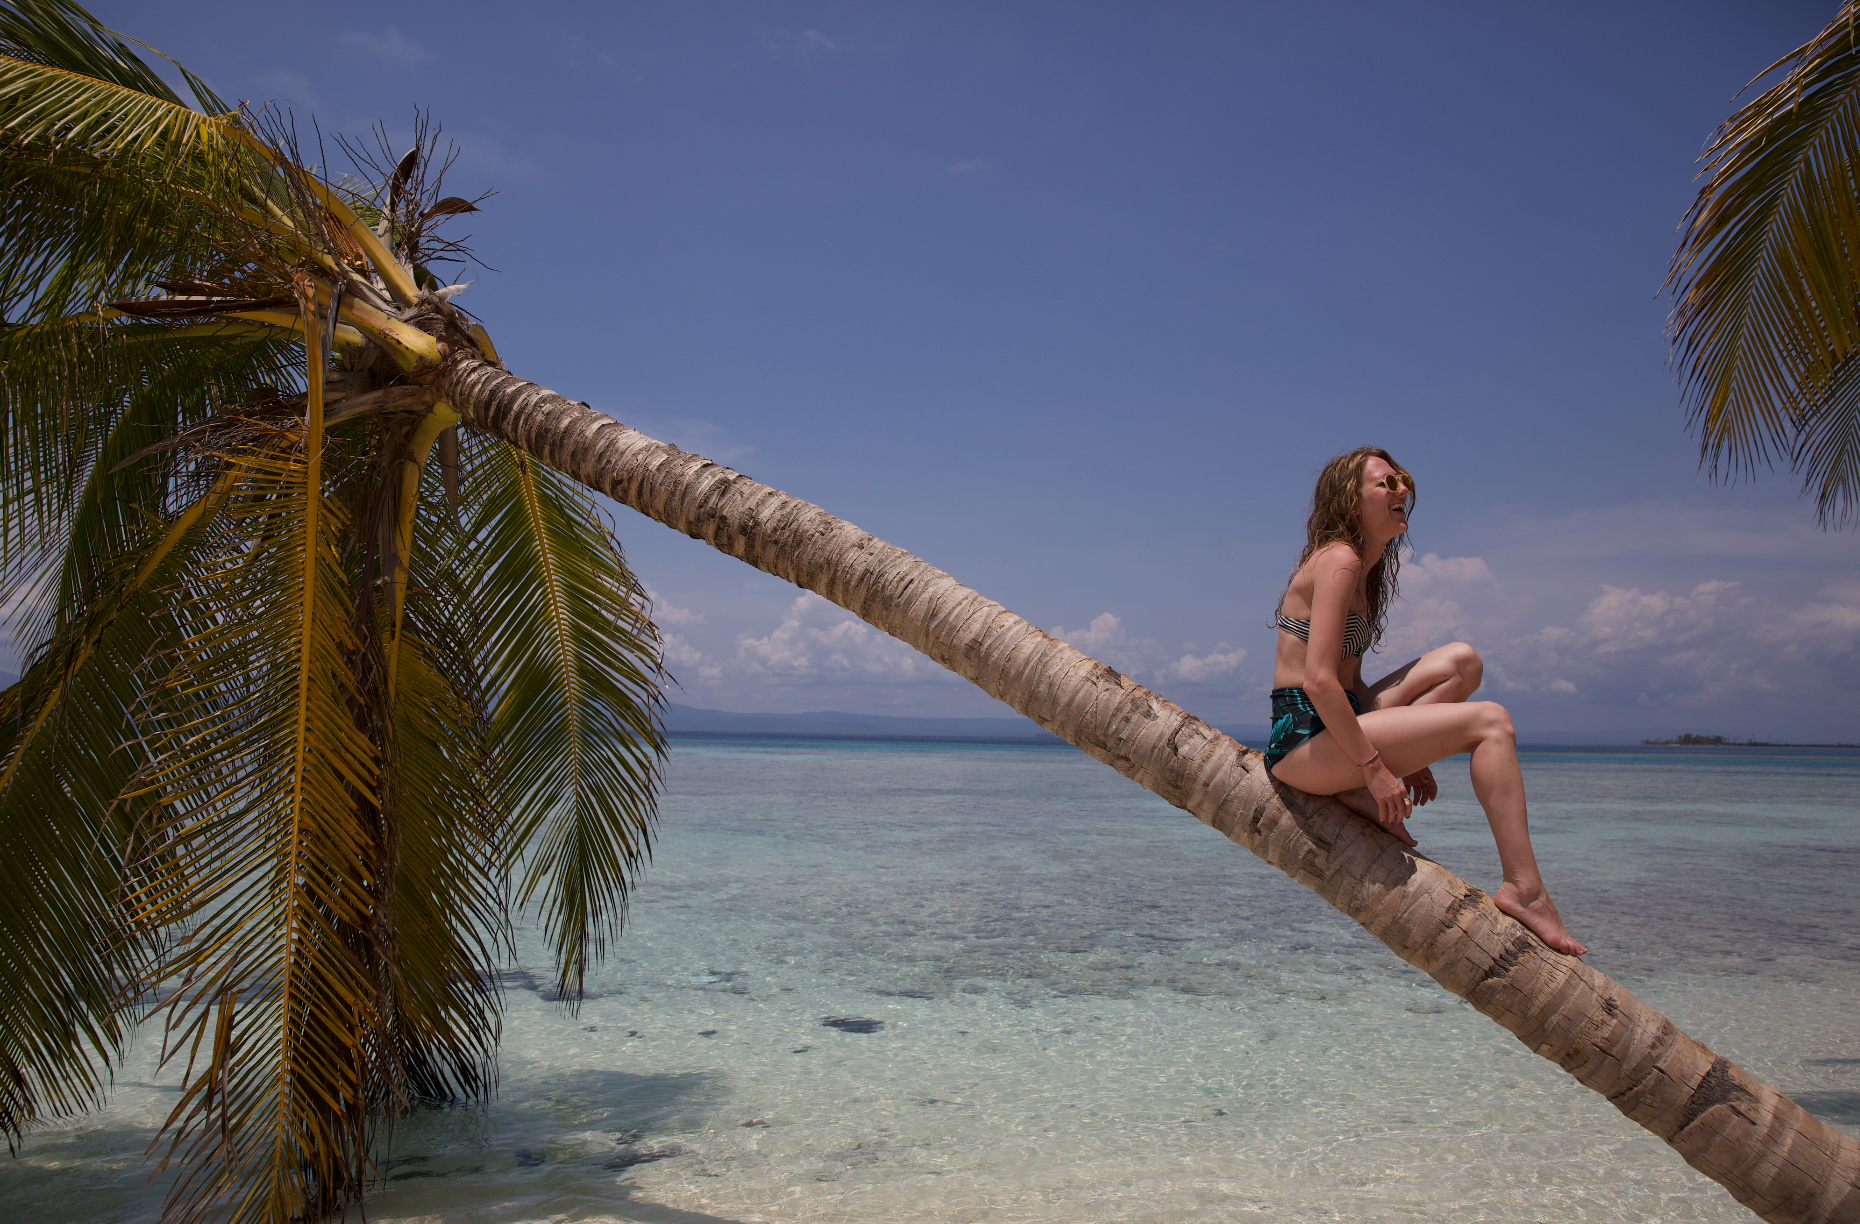 Brianna George thread caravan Panama review